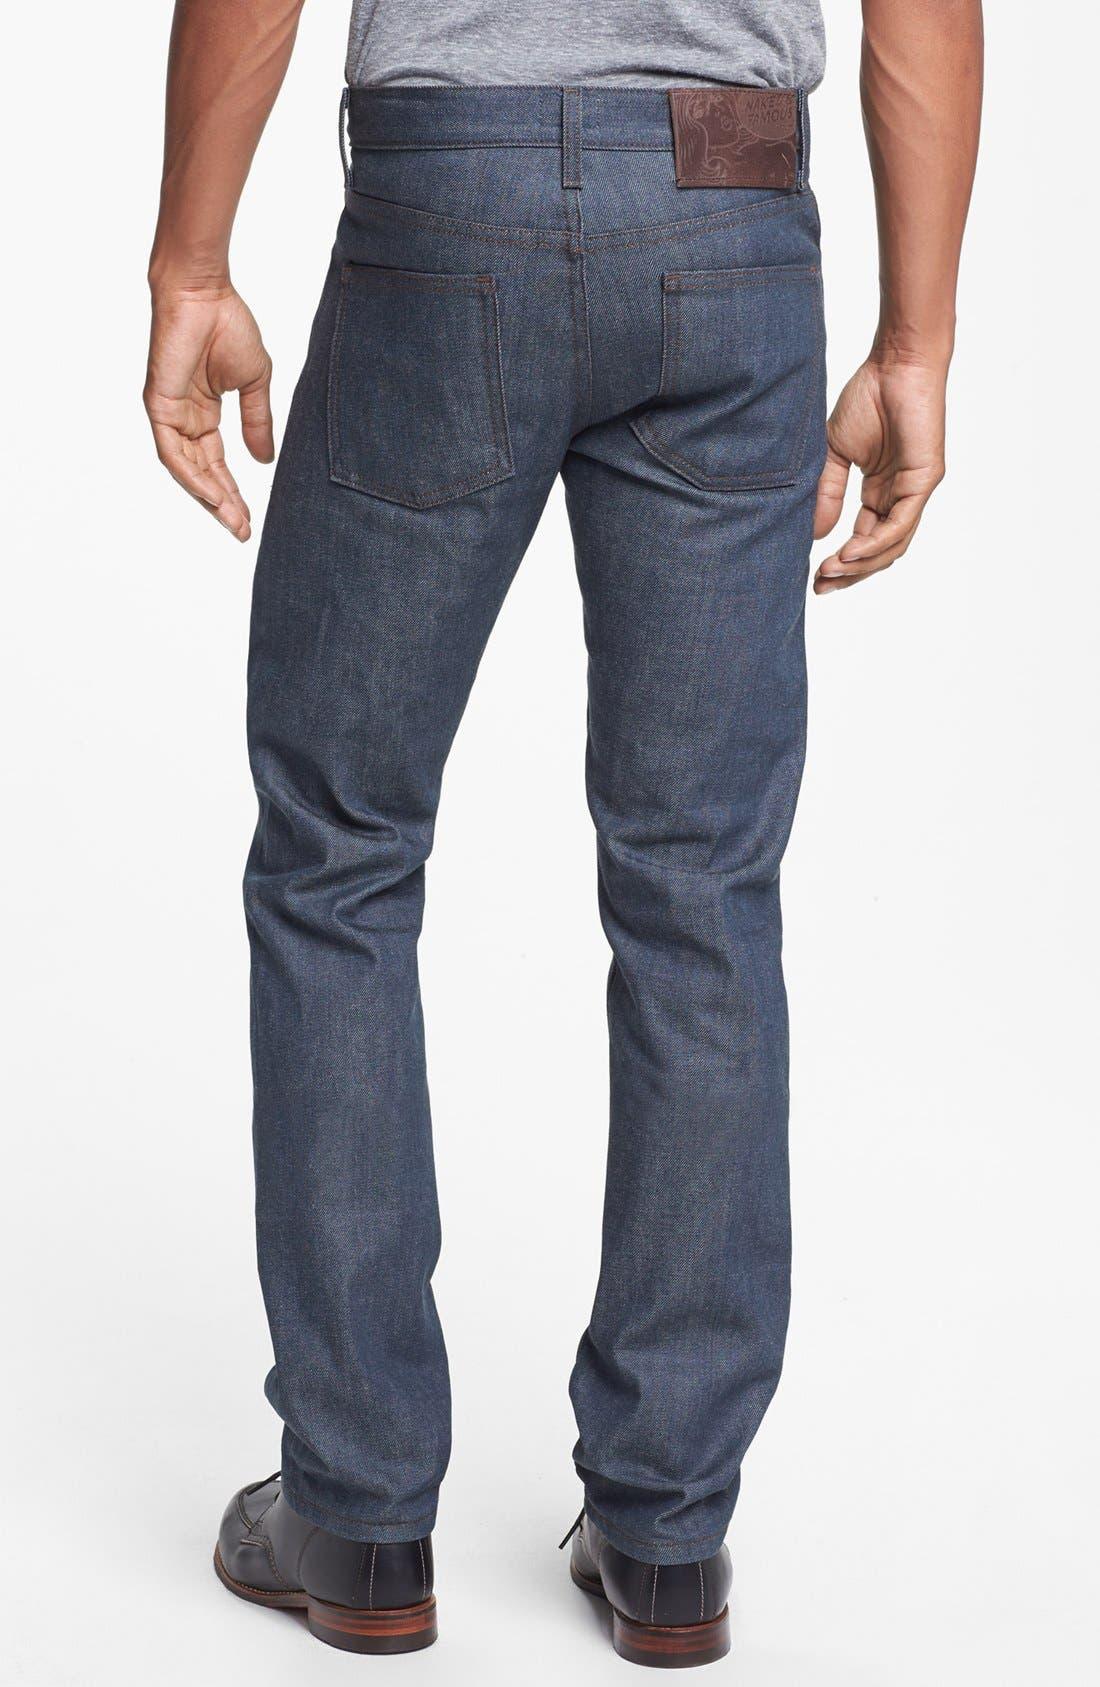 Main Image - Naked & Famous Denim 'Skinny Guy' Skinny Fit Selvedge Jeans